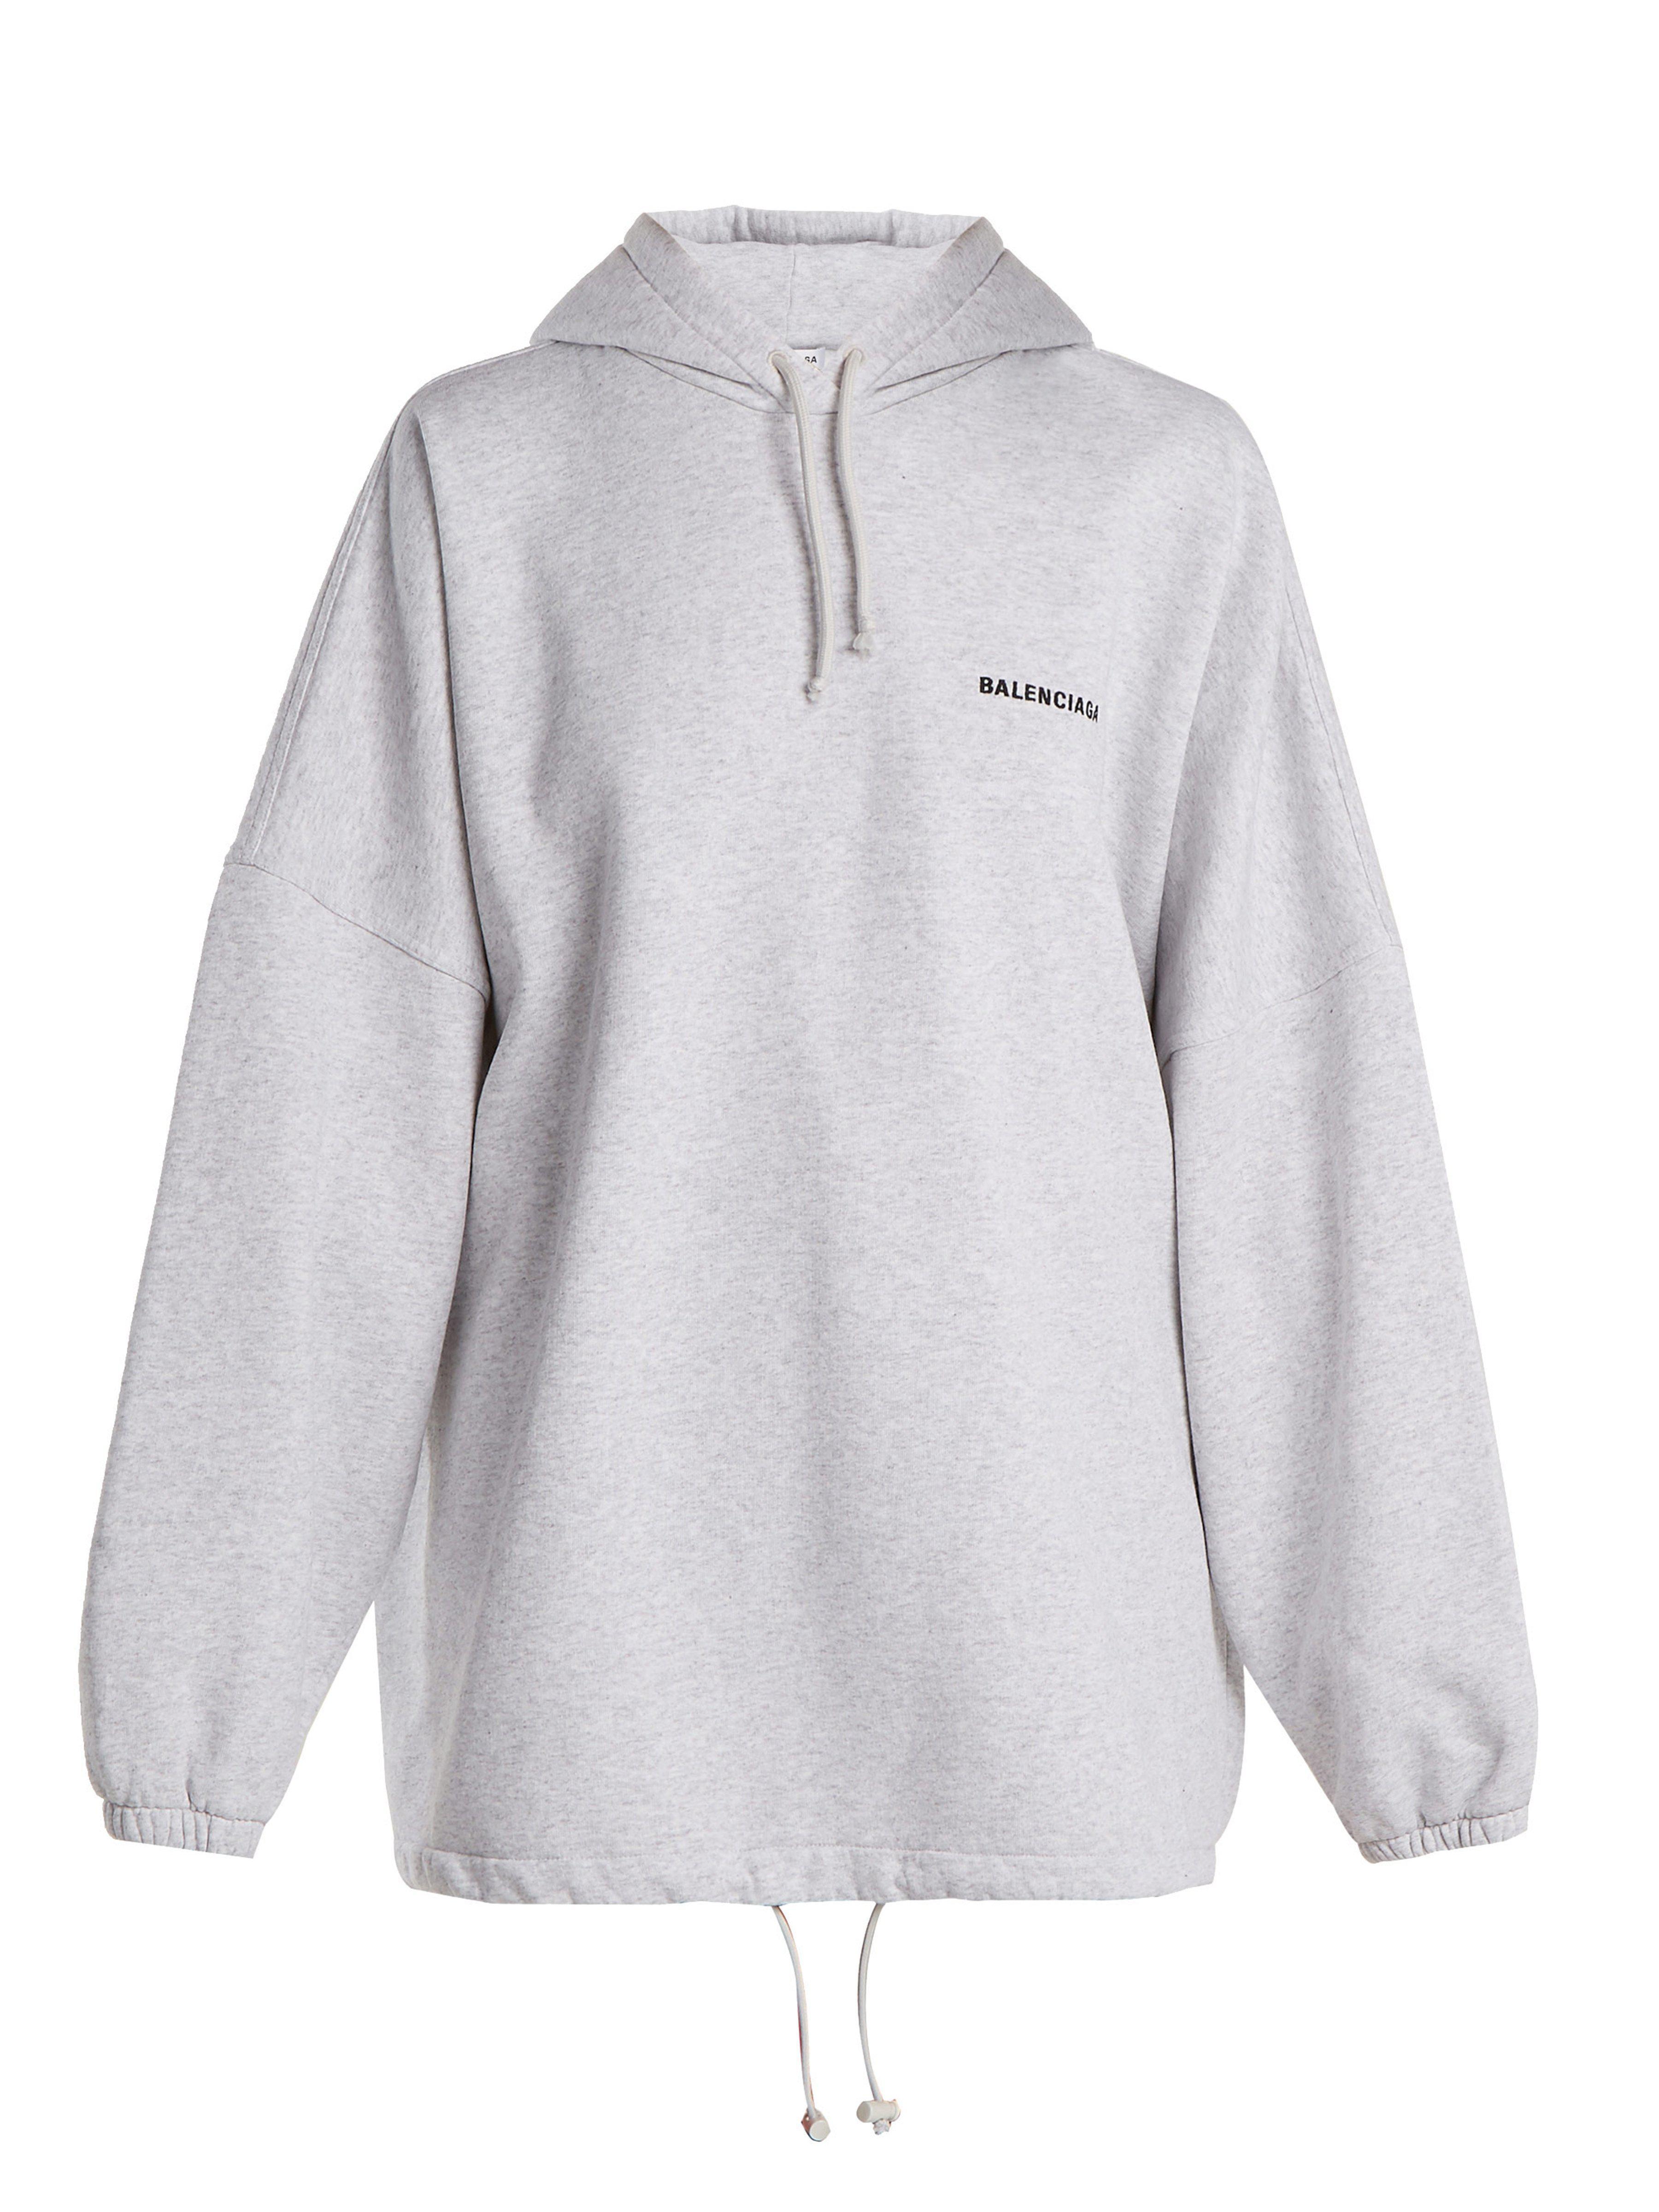 246f13ba2592 Balenciaga - Gray Oversized Cotton Blend Hooded Sweatshirt - Lyst. View  fullscreen